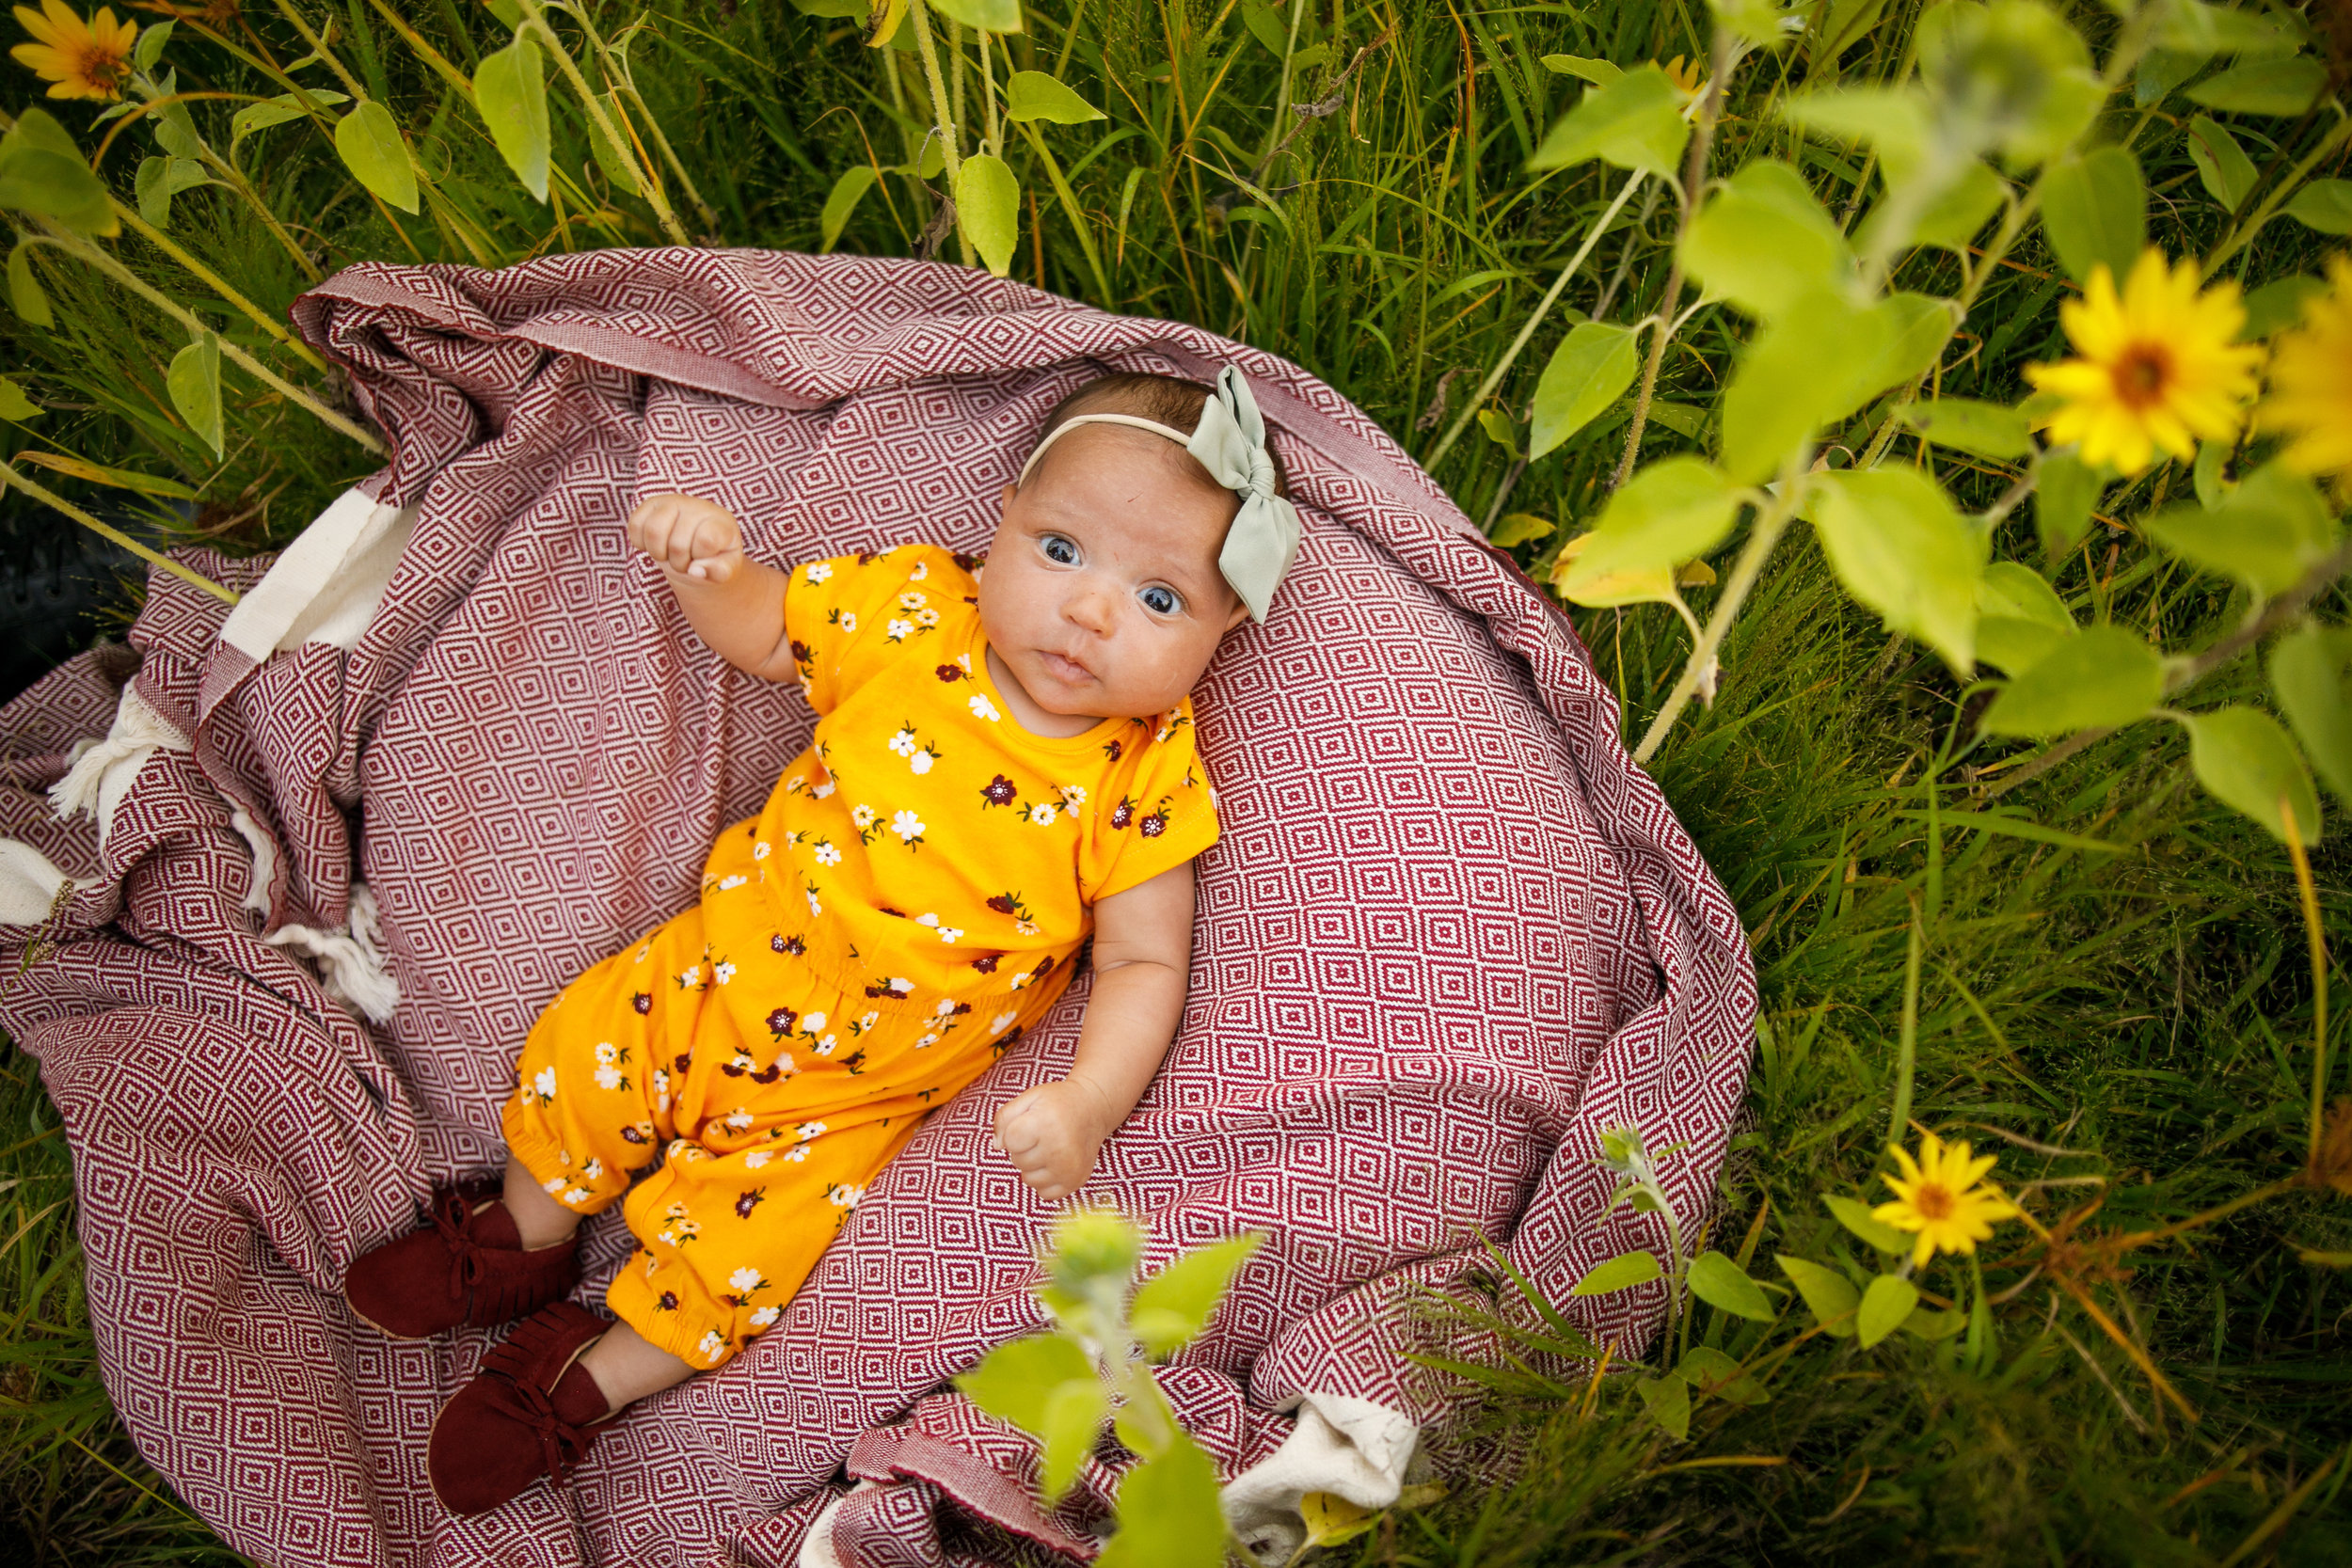 Morris Family Summer 2019 - Grand Rapids Photographer - Grand Rapids Family Photographer - Ed Dunneback and Girls - J Darling Photo 036.jpg